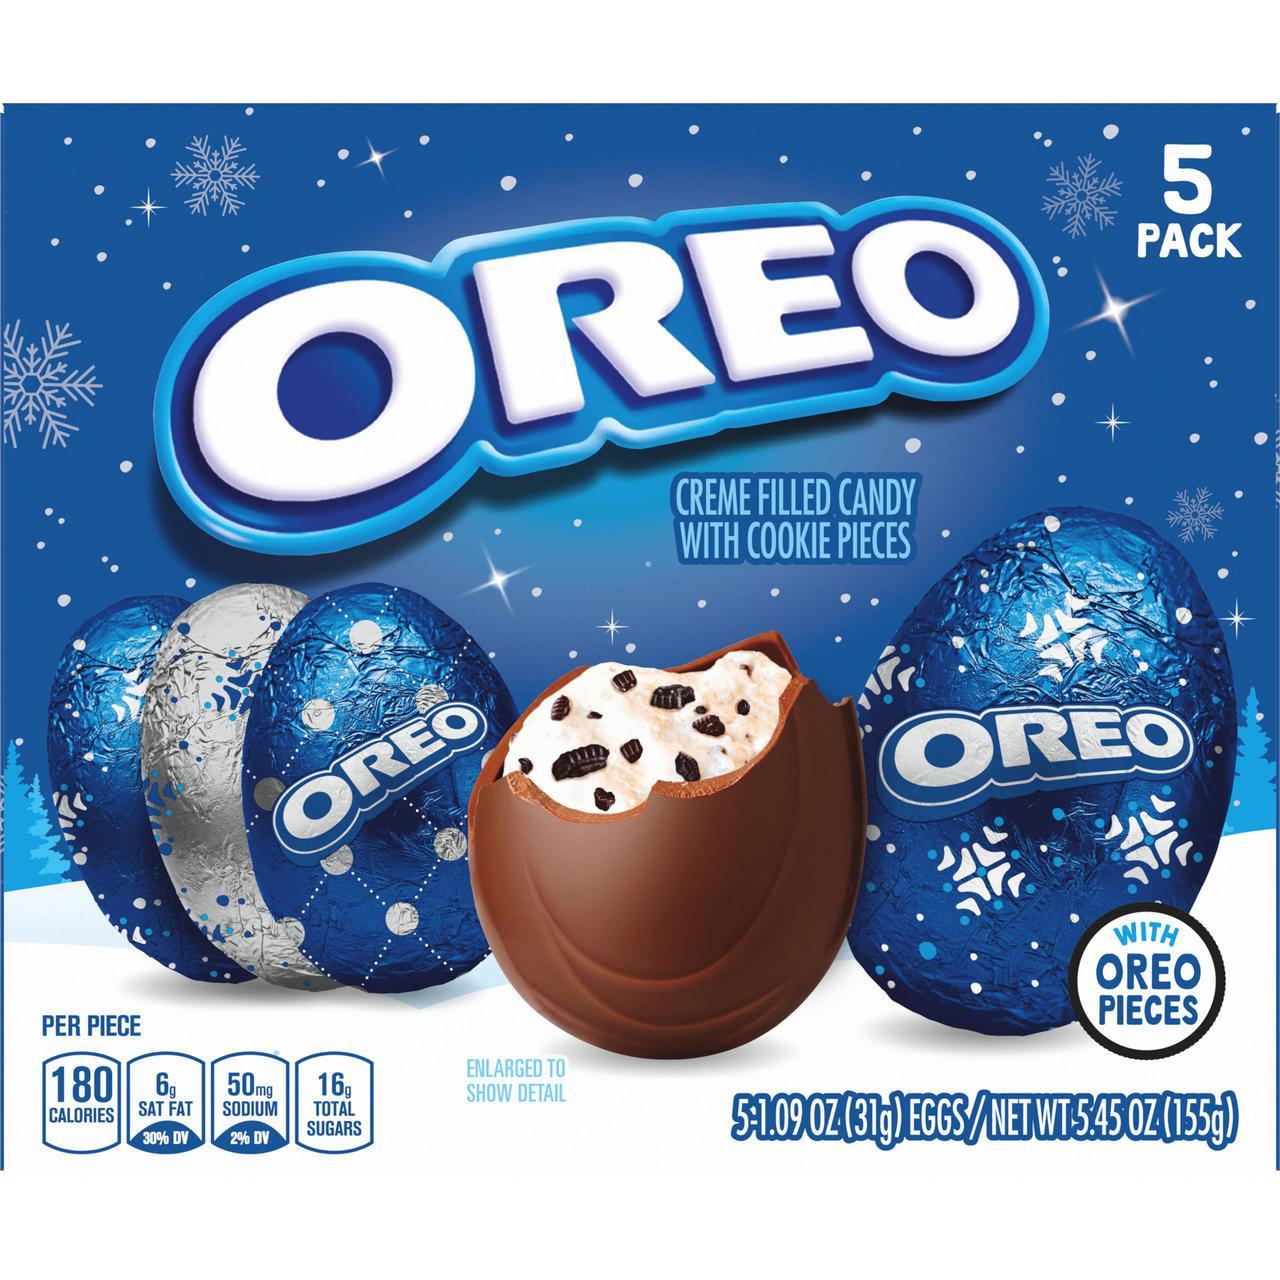 「OREO EGG」特殊蛋型設計,晉升IG最夯打卡小物。圖/取自Walmart